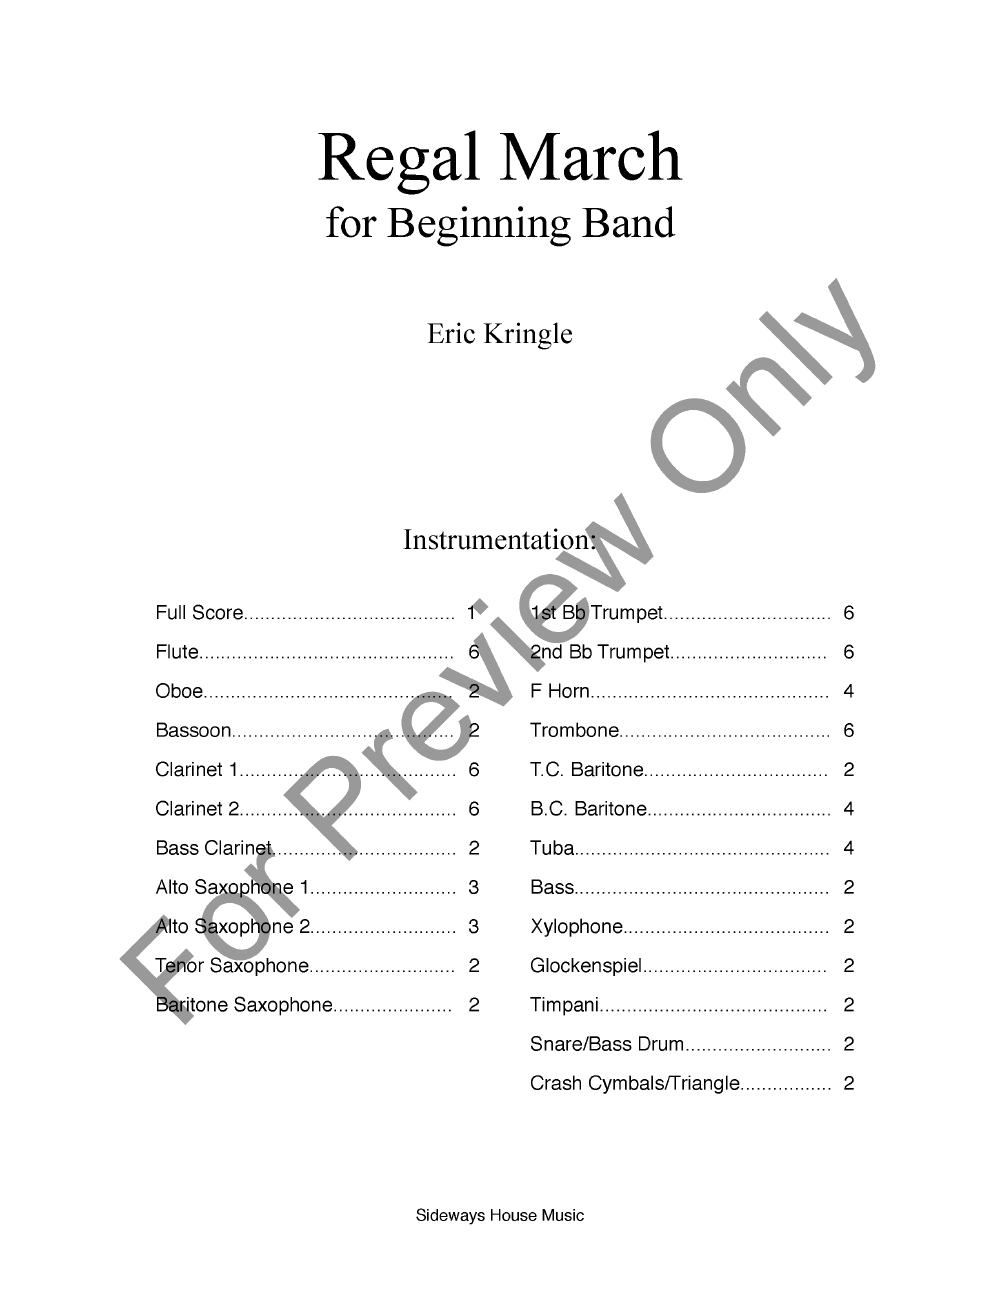 Regal March Thumbnail